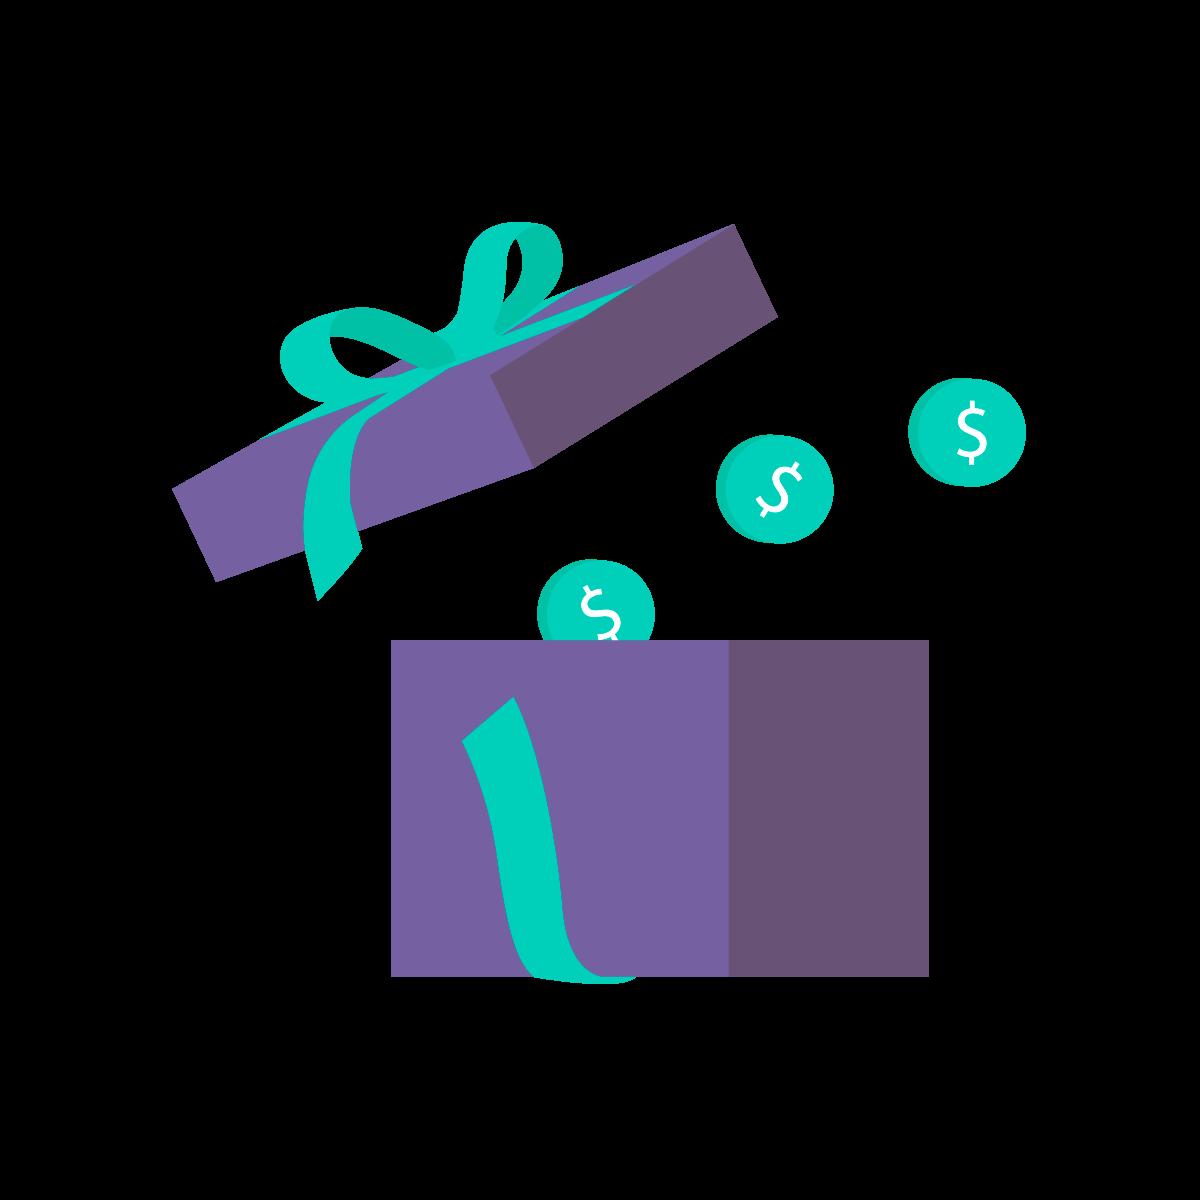 Enjoy the gift of more rewards